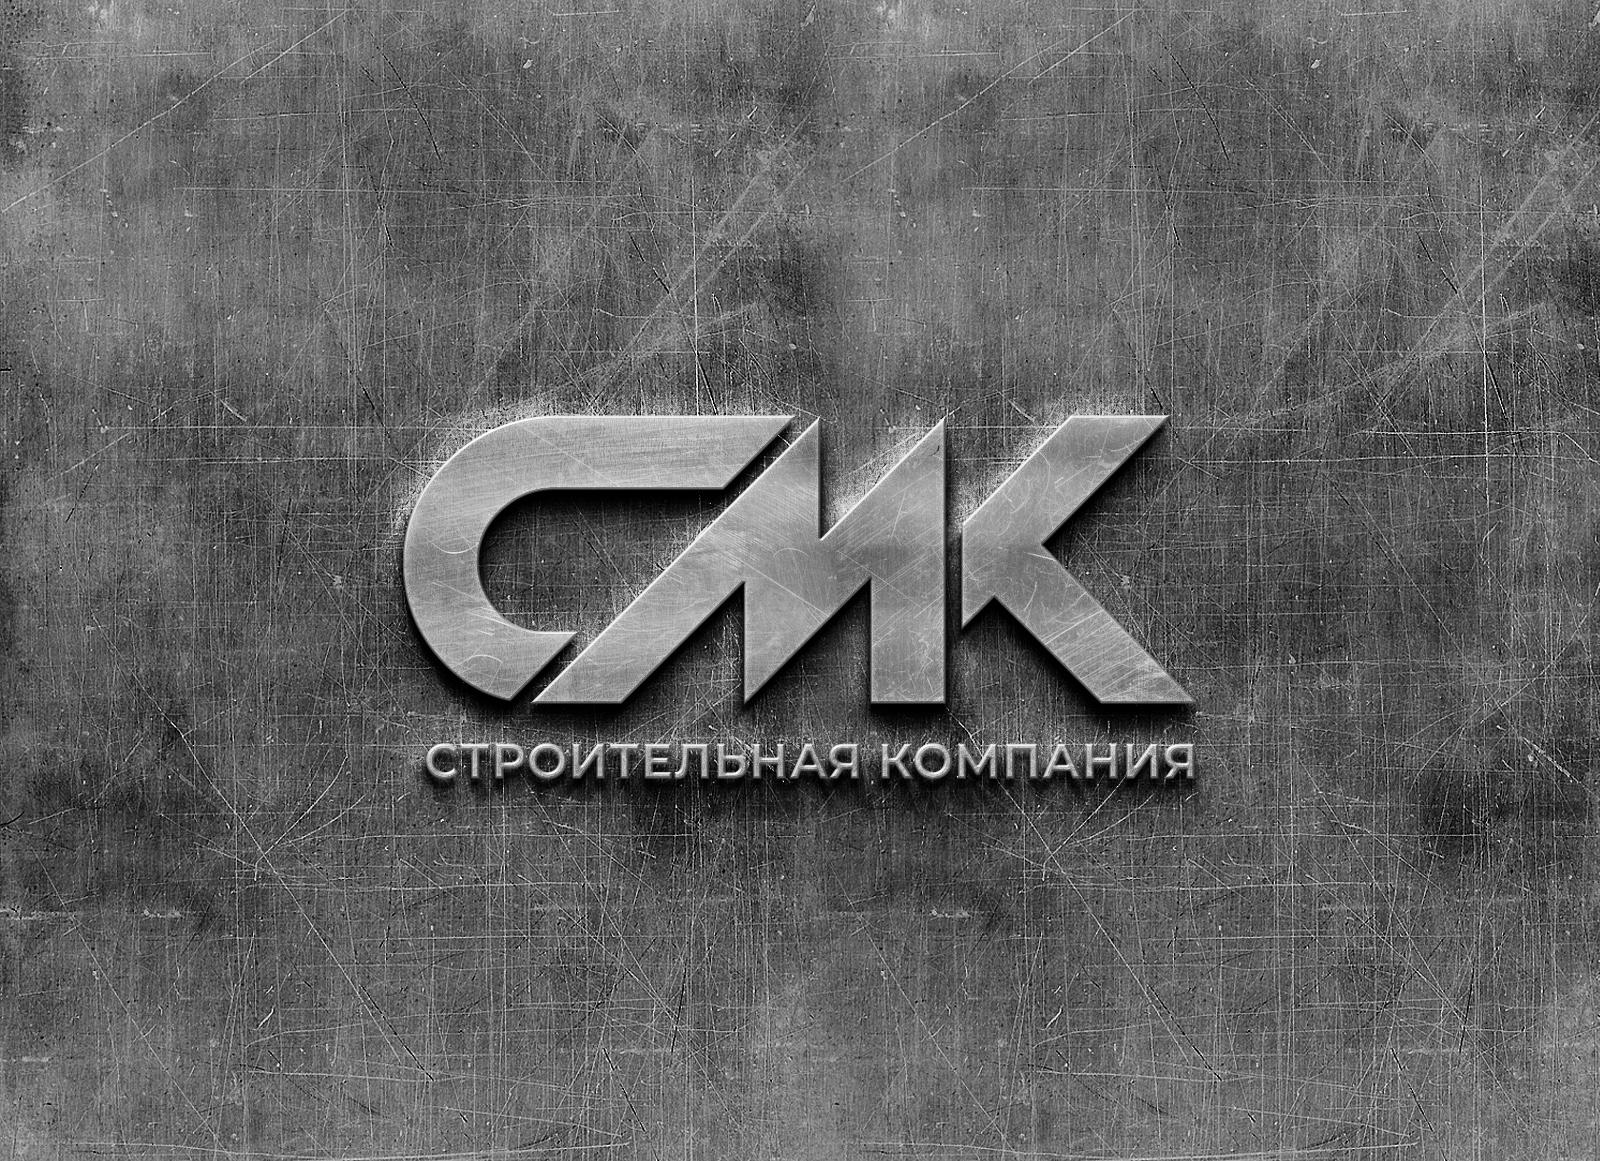 Разработка логотипа компании фото f_3415de118e3ef8e5.jpg